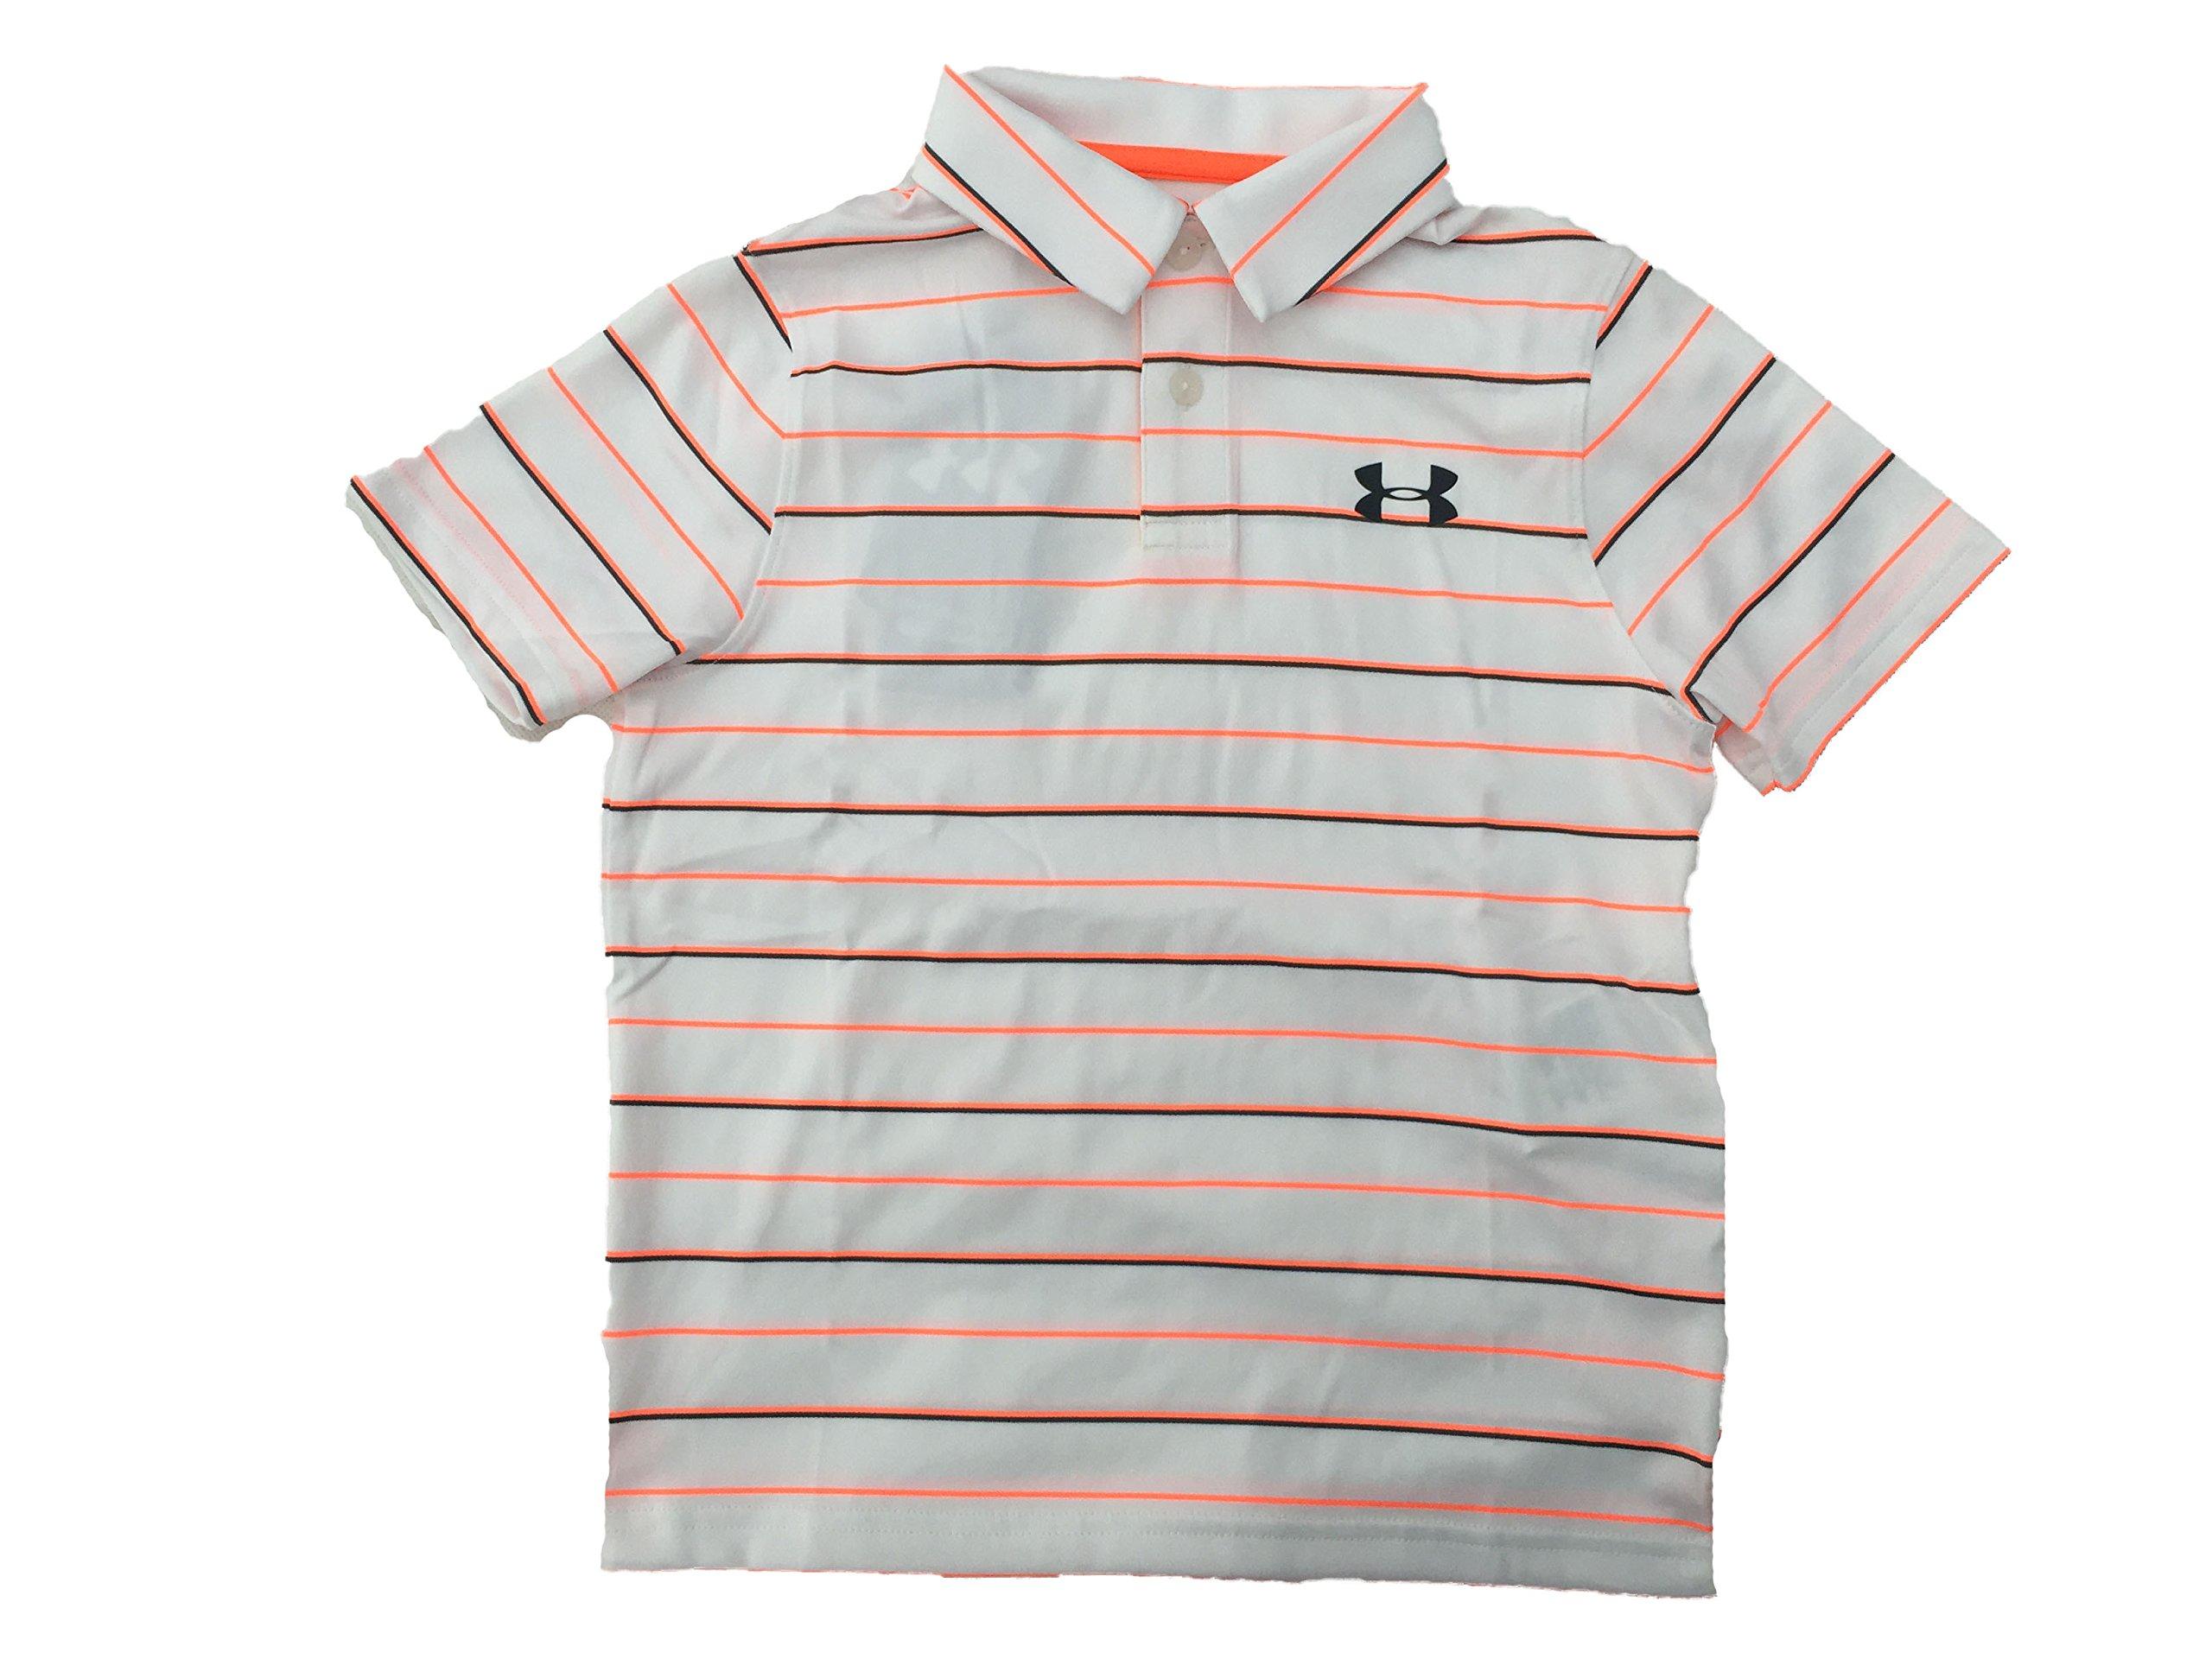 Under Armour Boy`s Threadborne Bunker Golf Polo Shirt (White(1298097-101)/Max Orange, Youth Small)